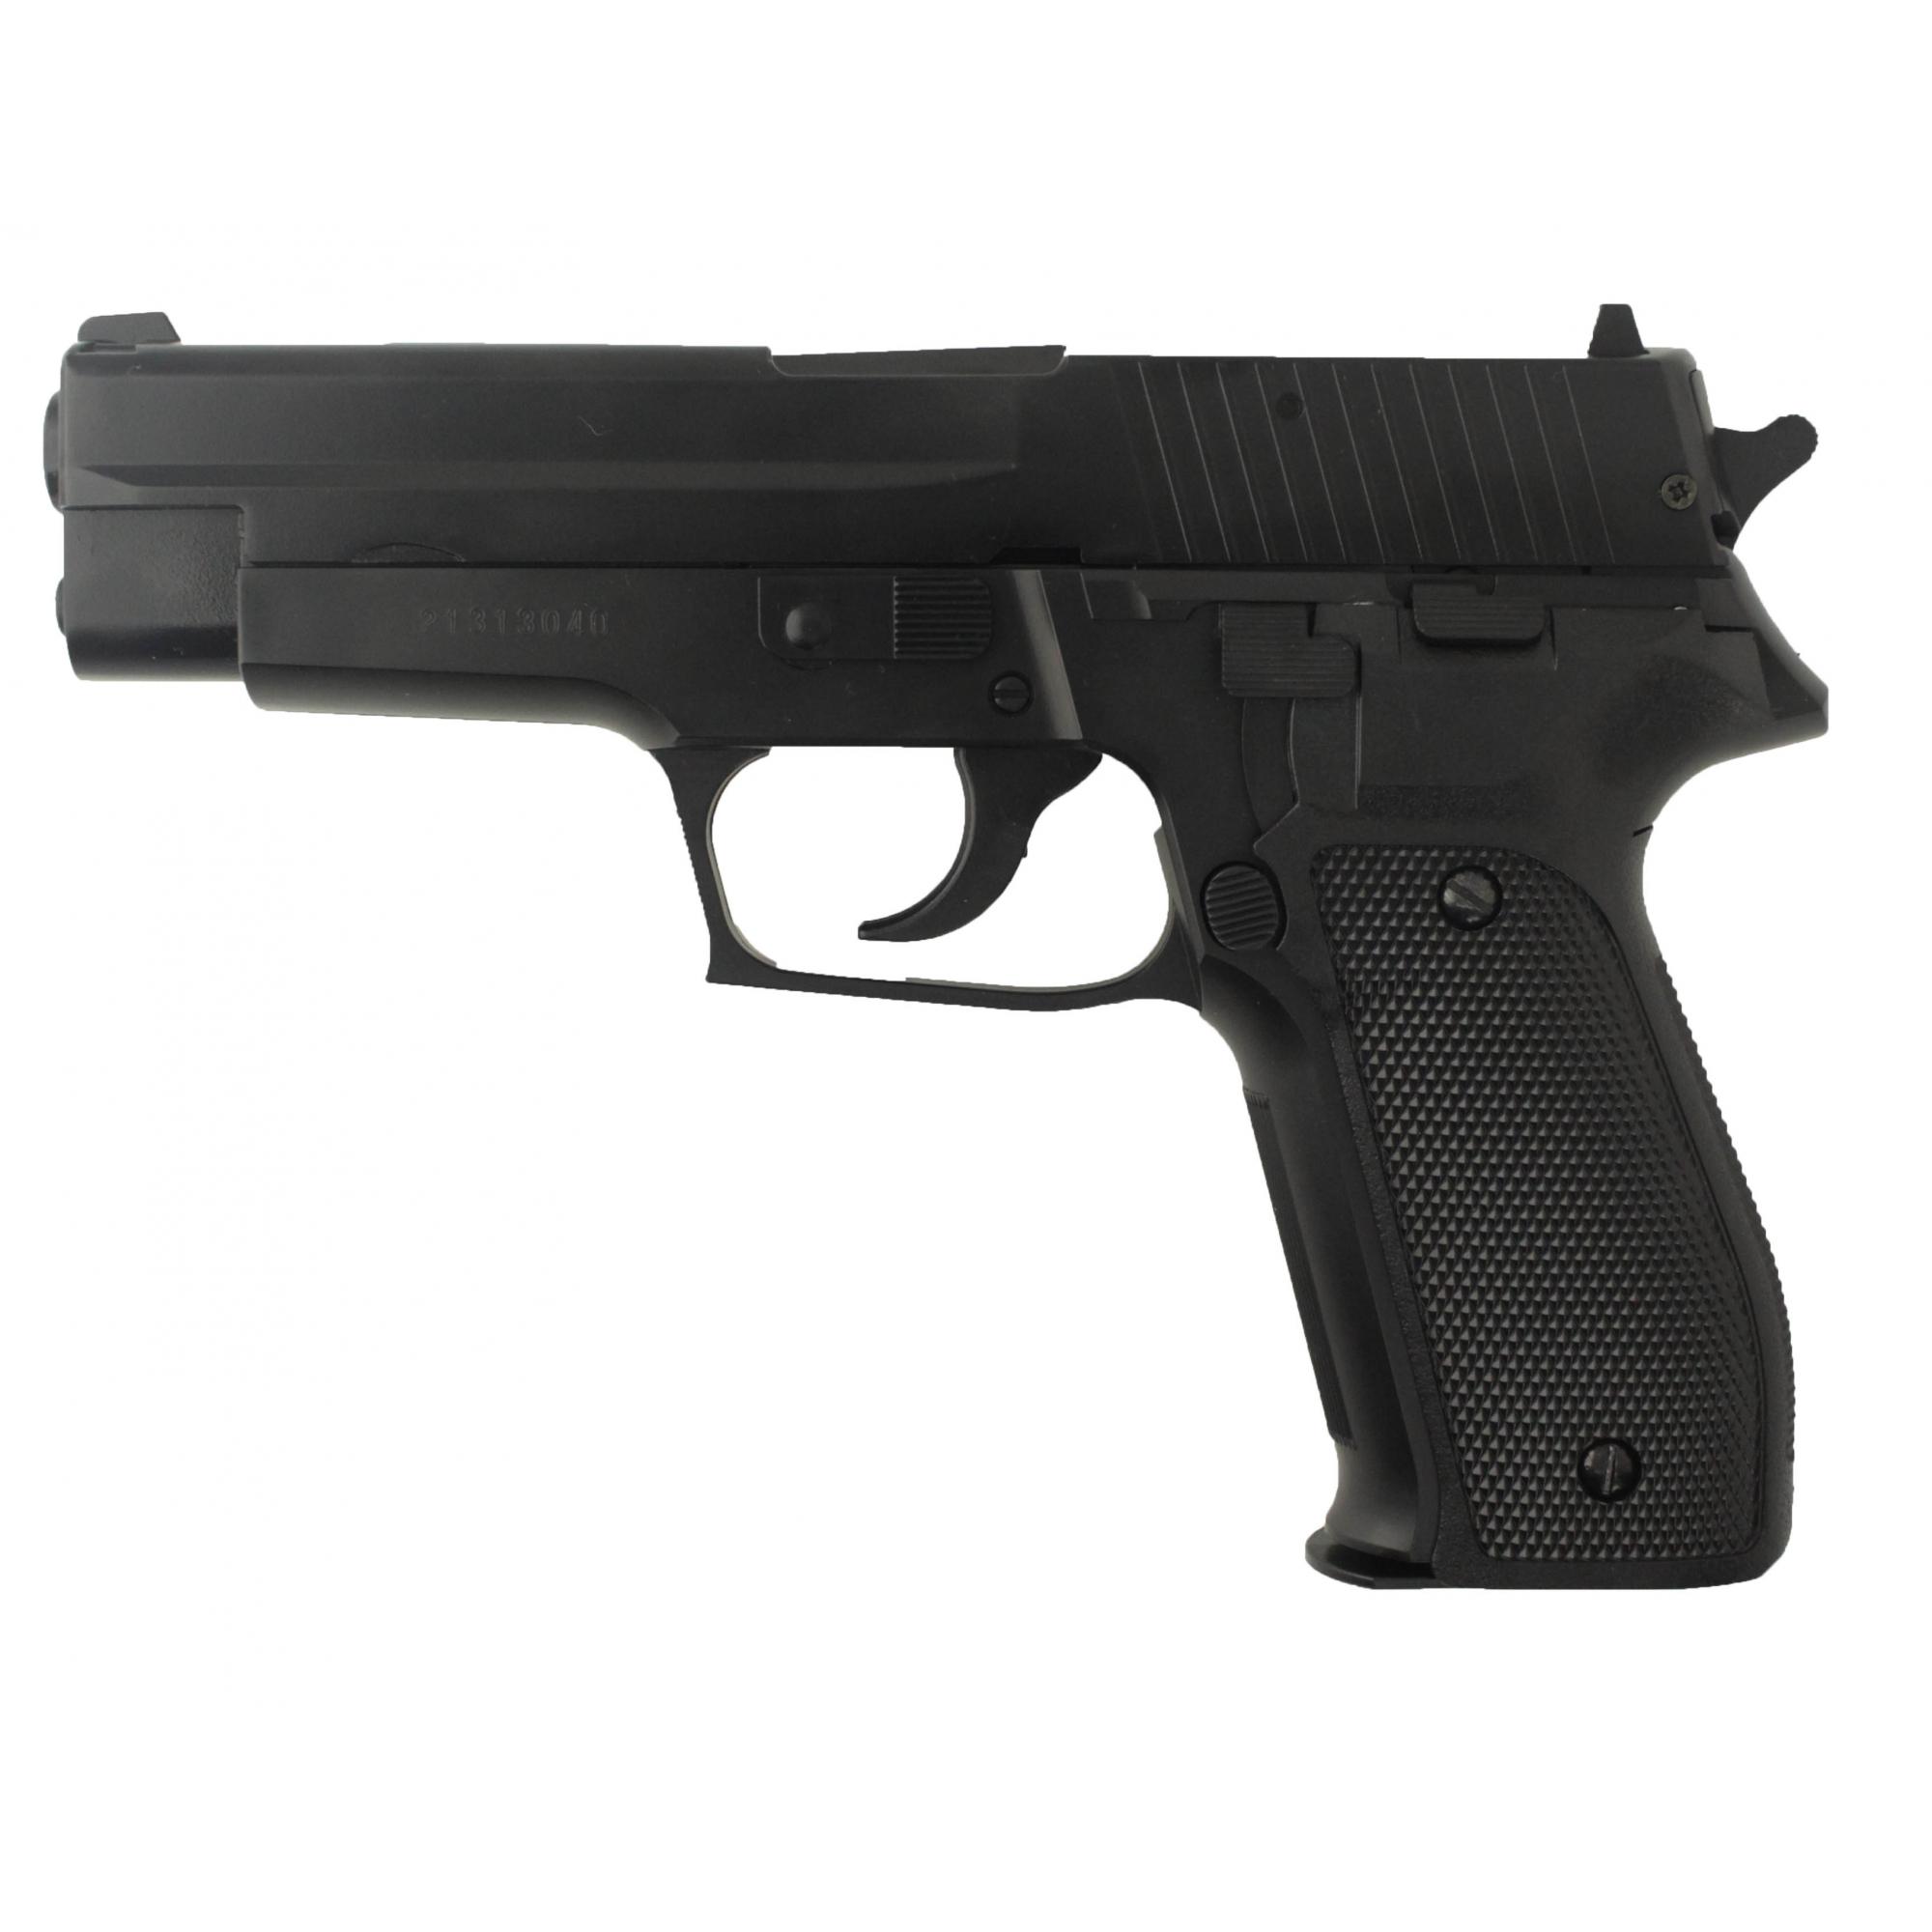 Pistola KWC P226 Mola Metal 4,5mm